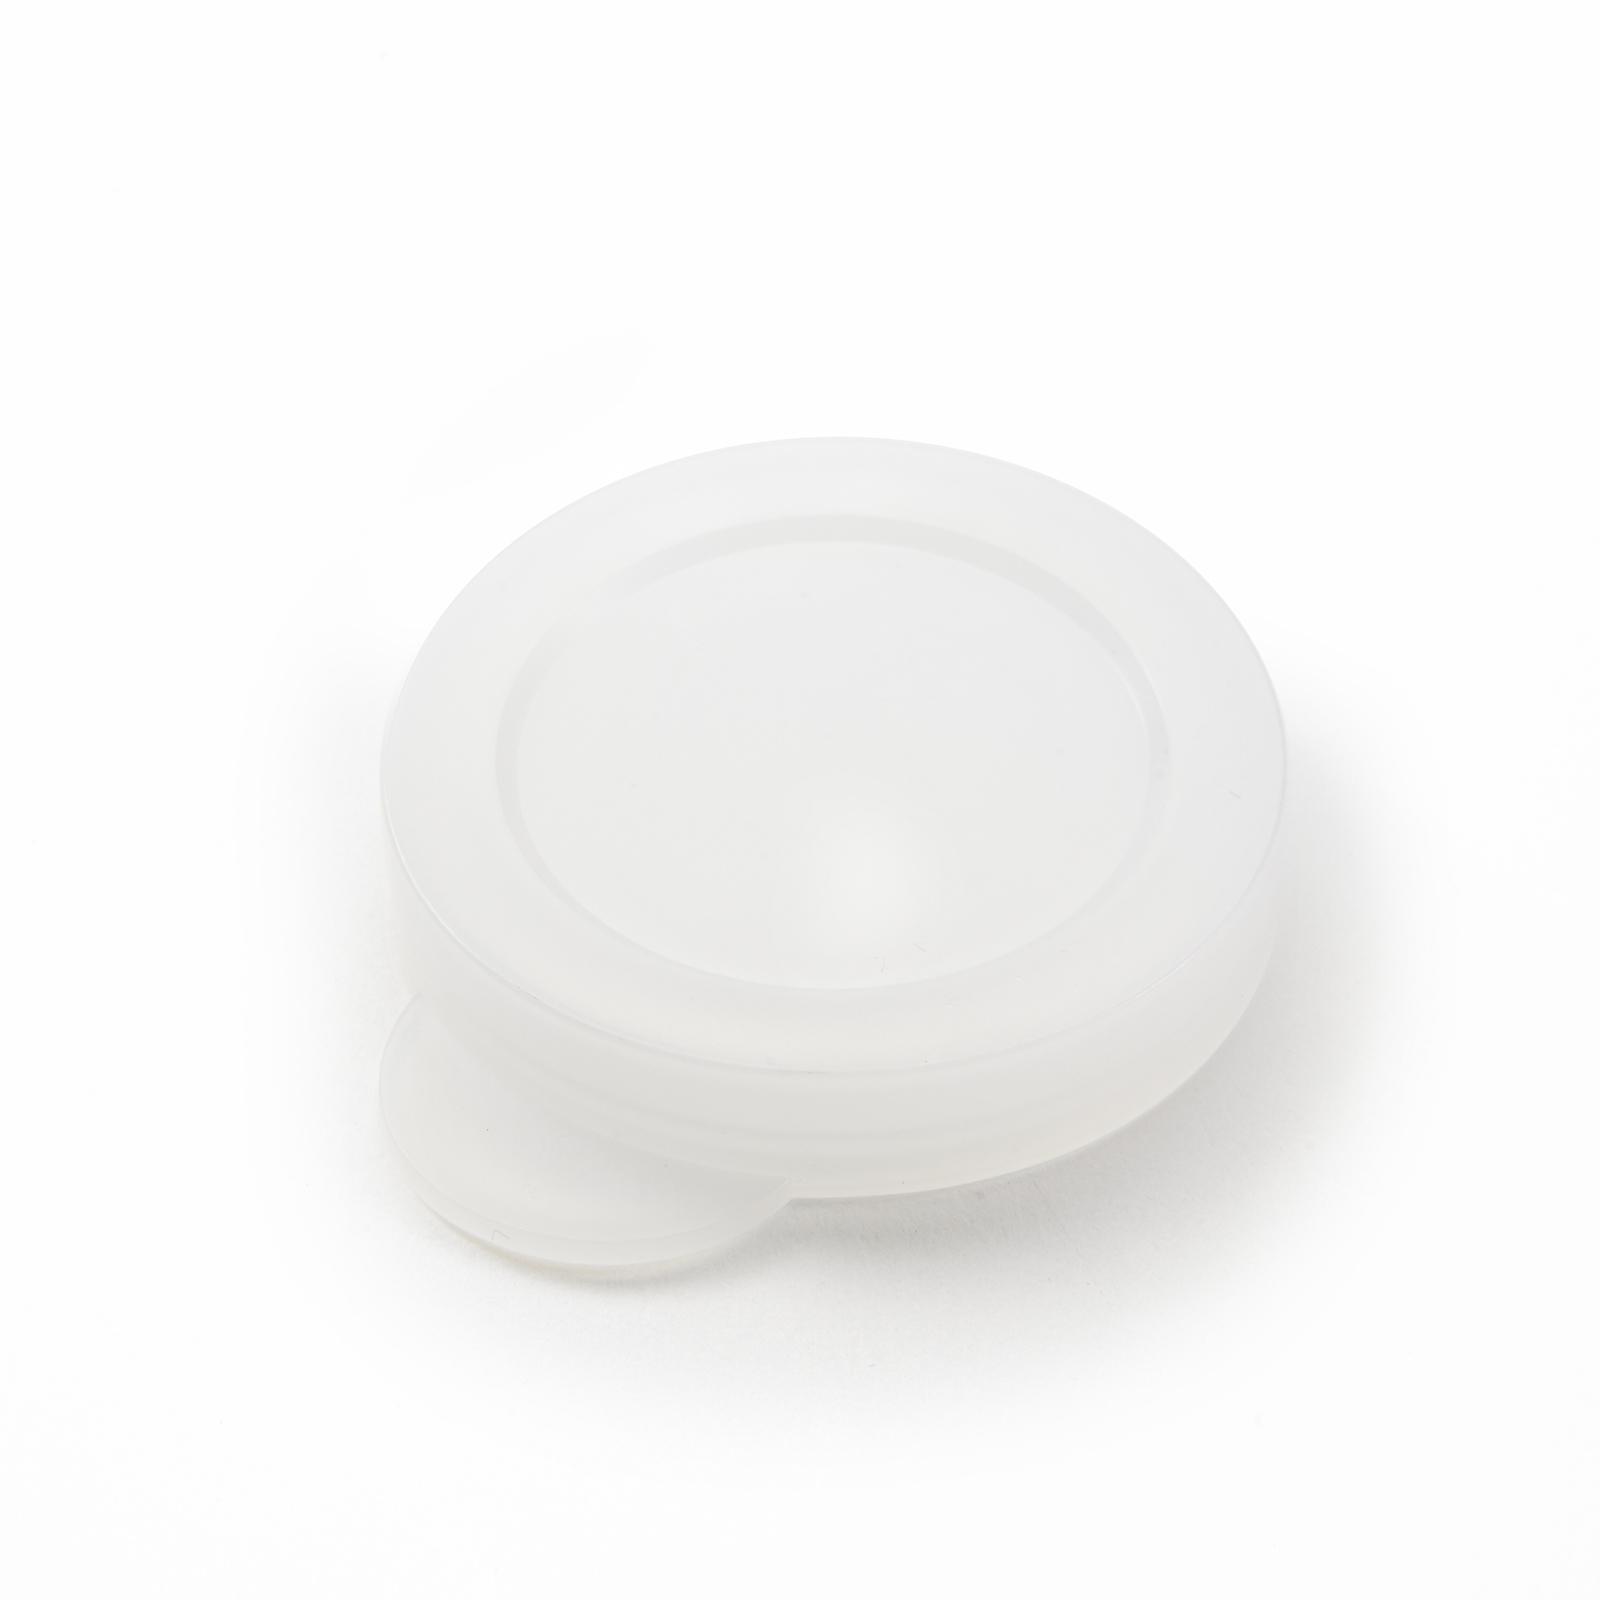 American Metalcraft CAP32 glass jar lid